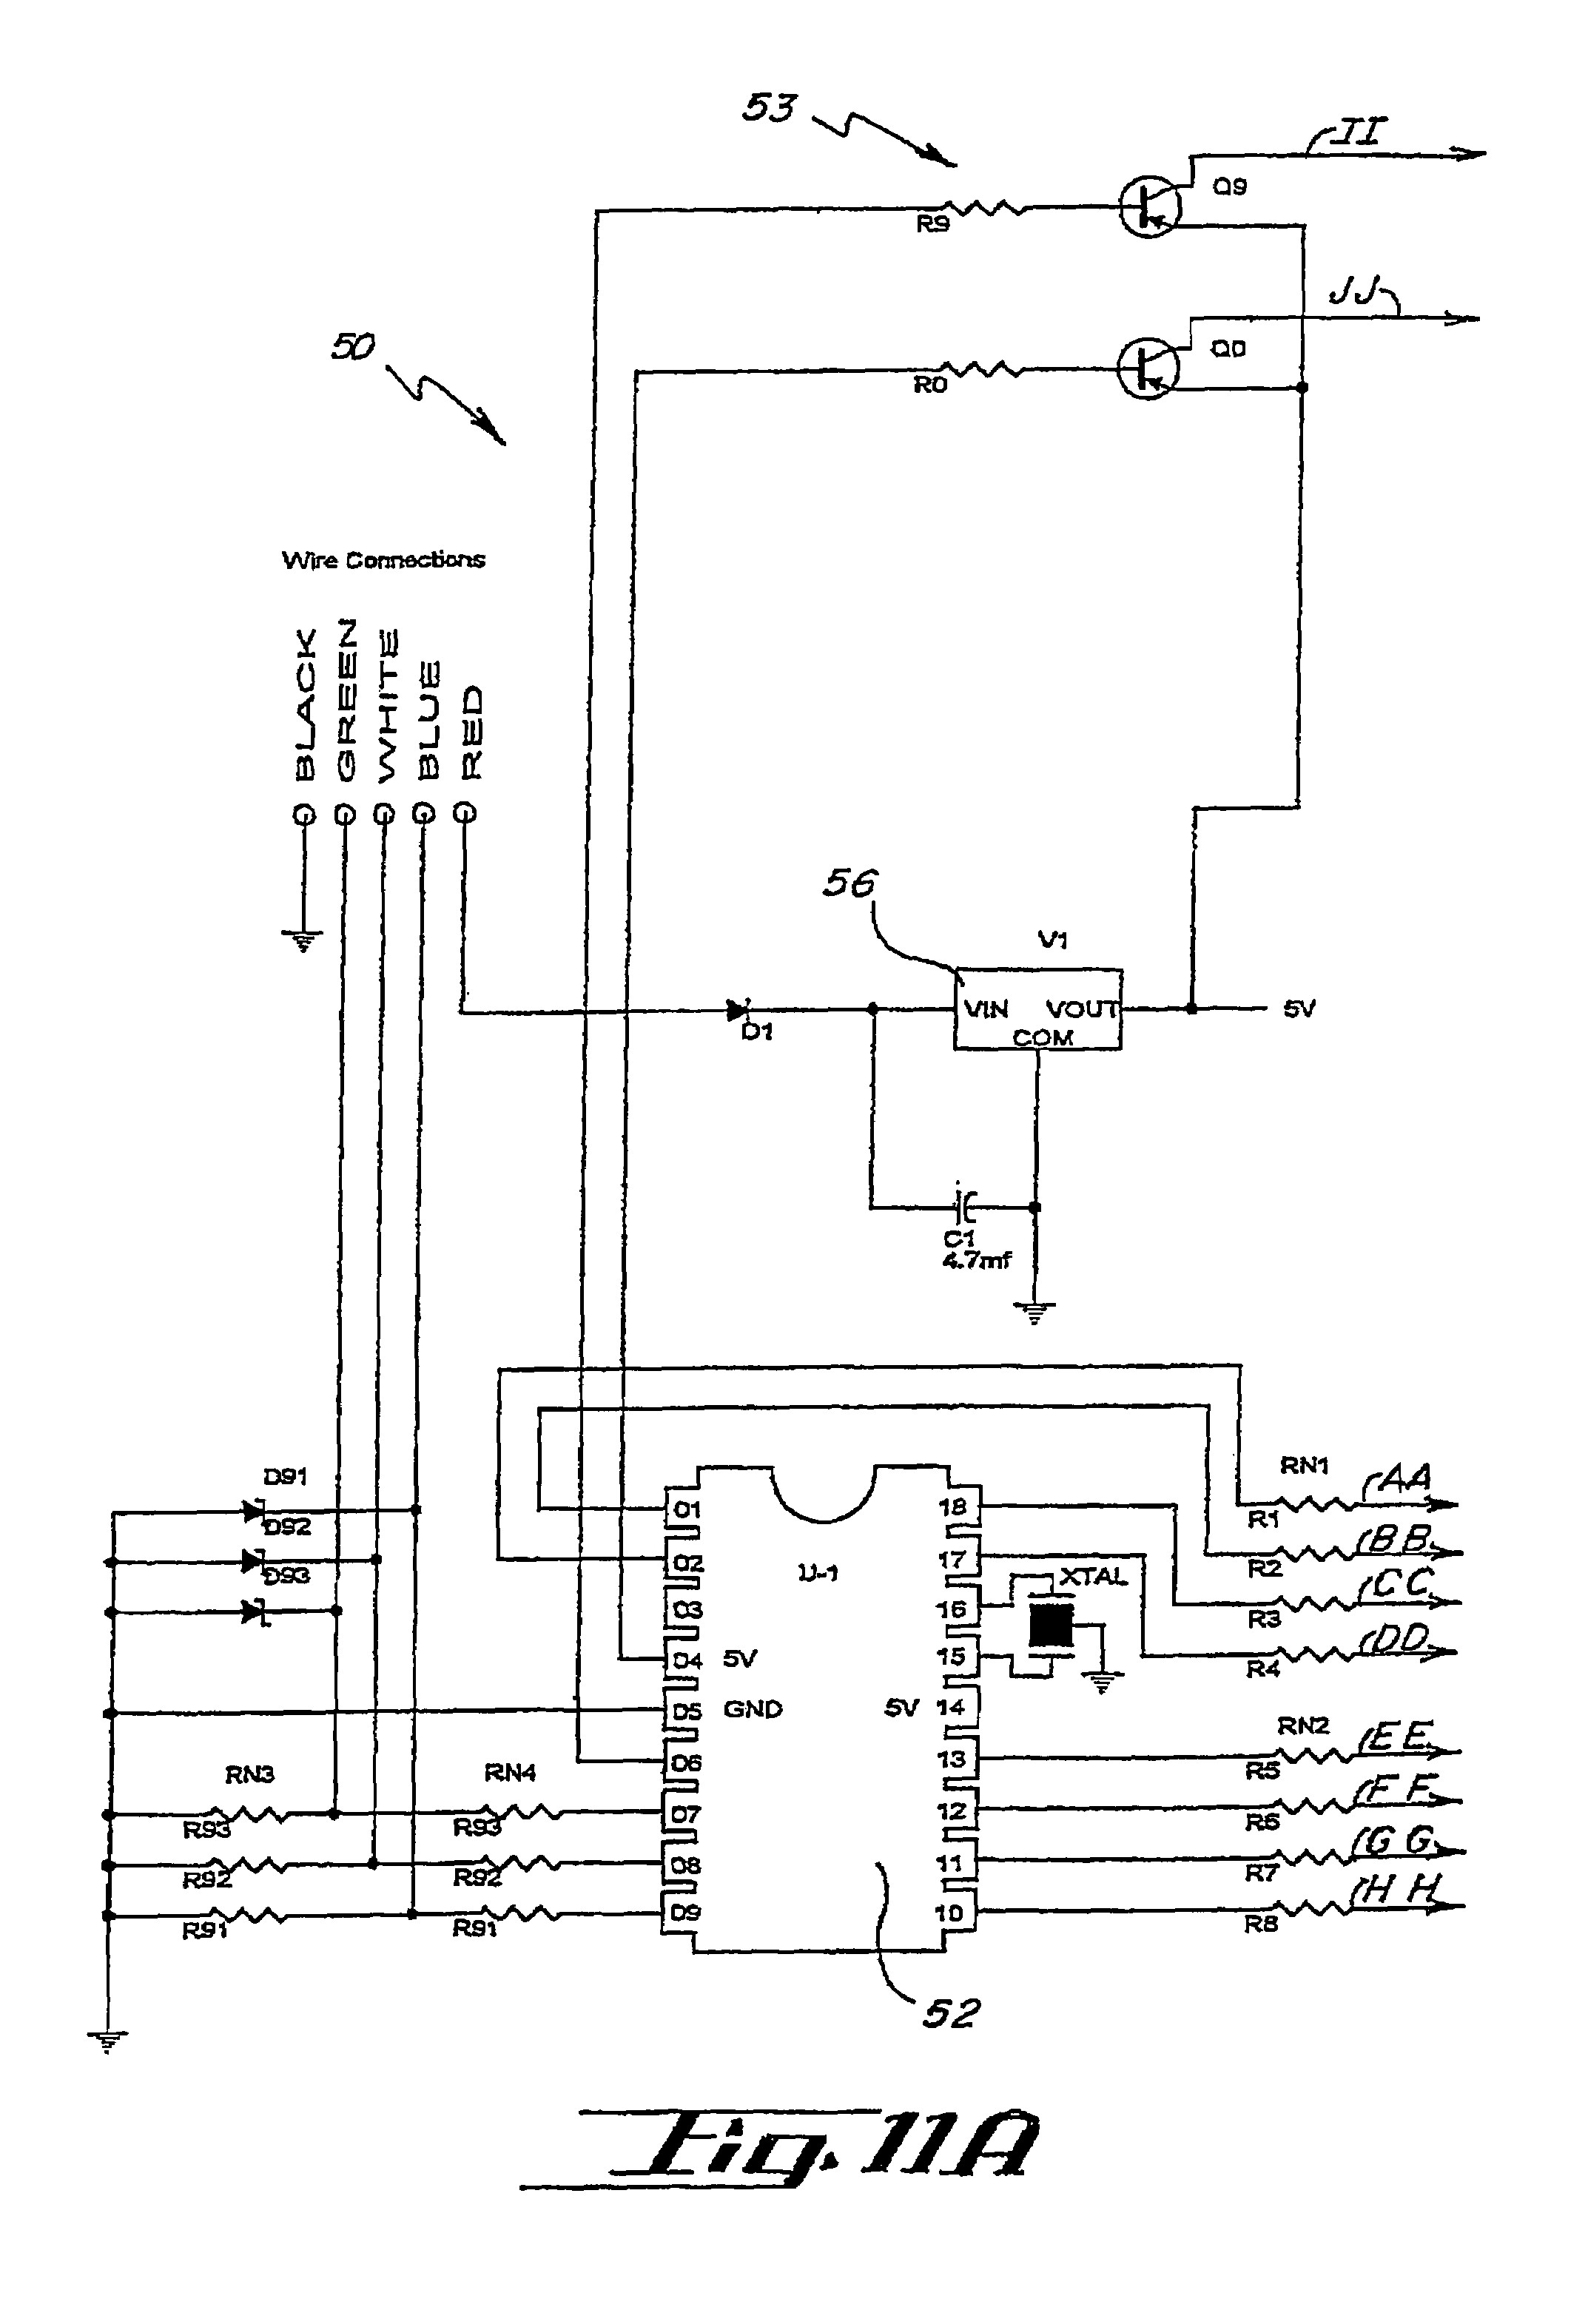 DF_6253] Code 3 Siren Wiring Diagram Free DiagramCran Nerve Arnes Feren Scoba Mohammedshrine Librar Wiring 101